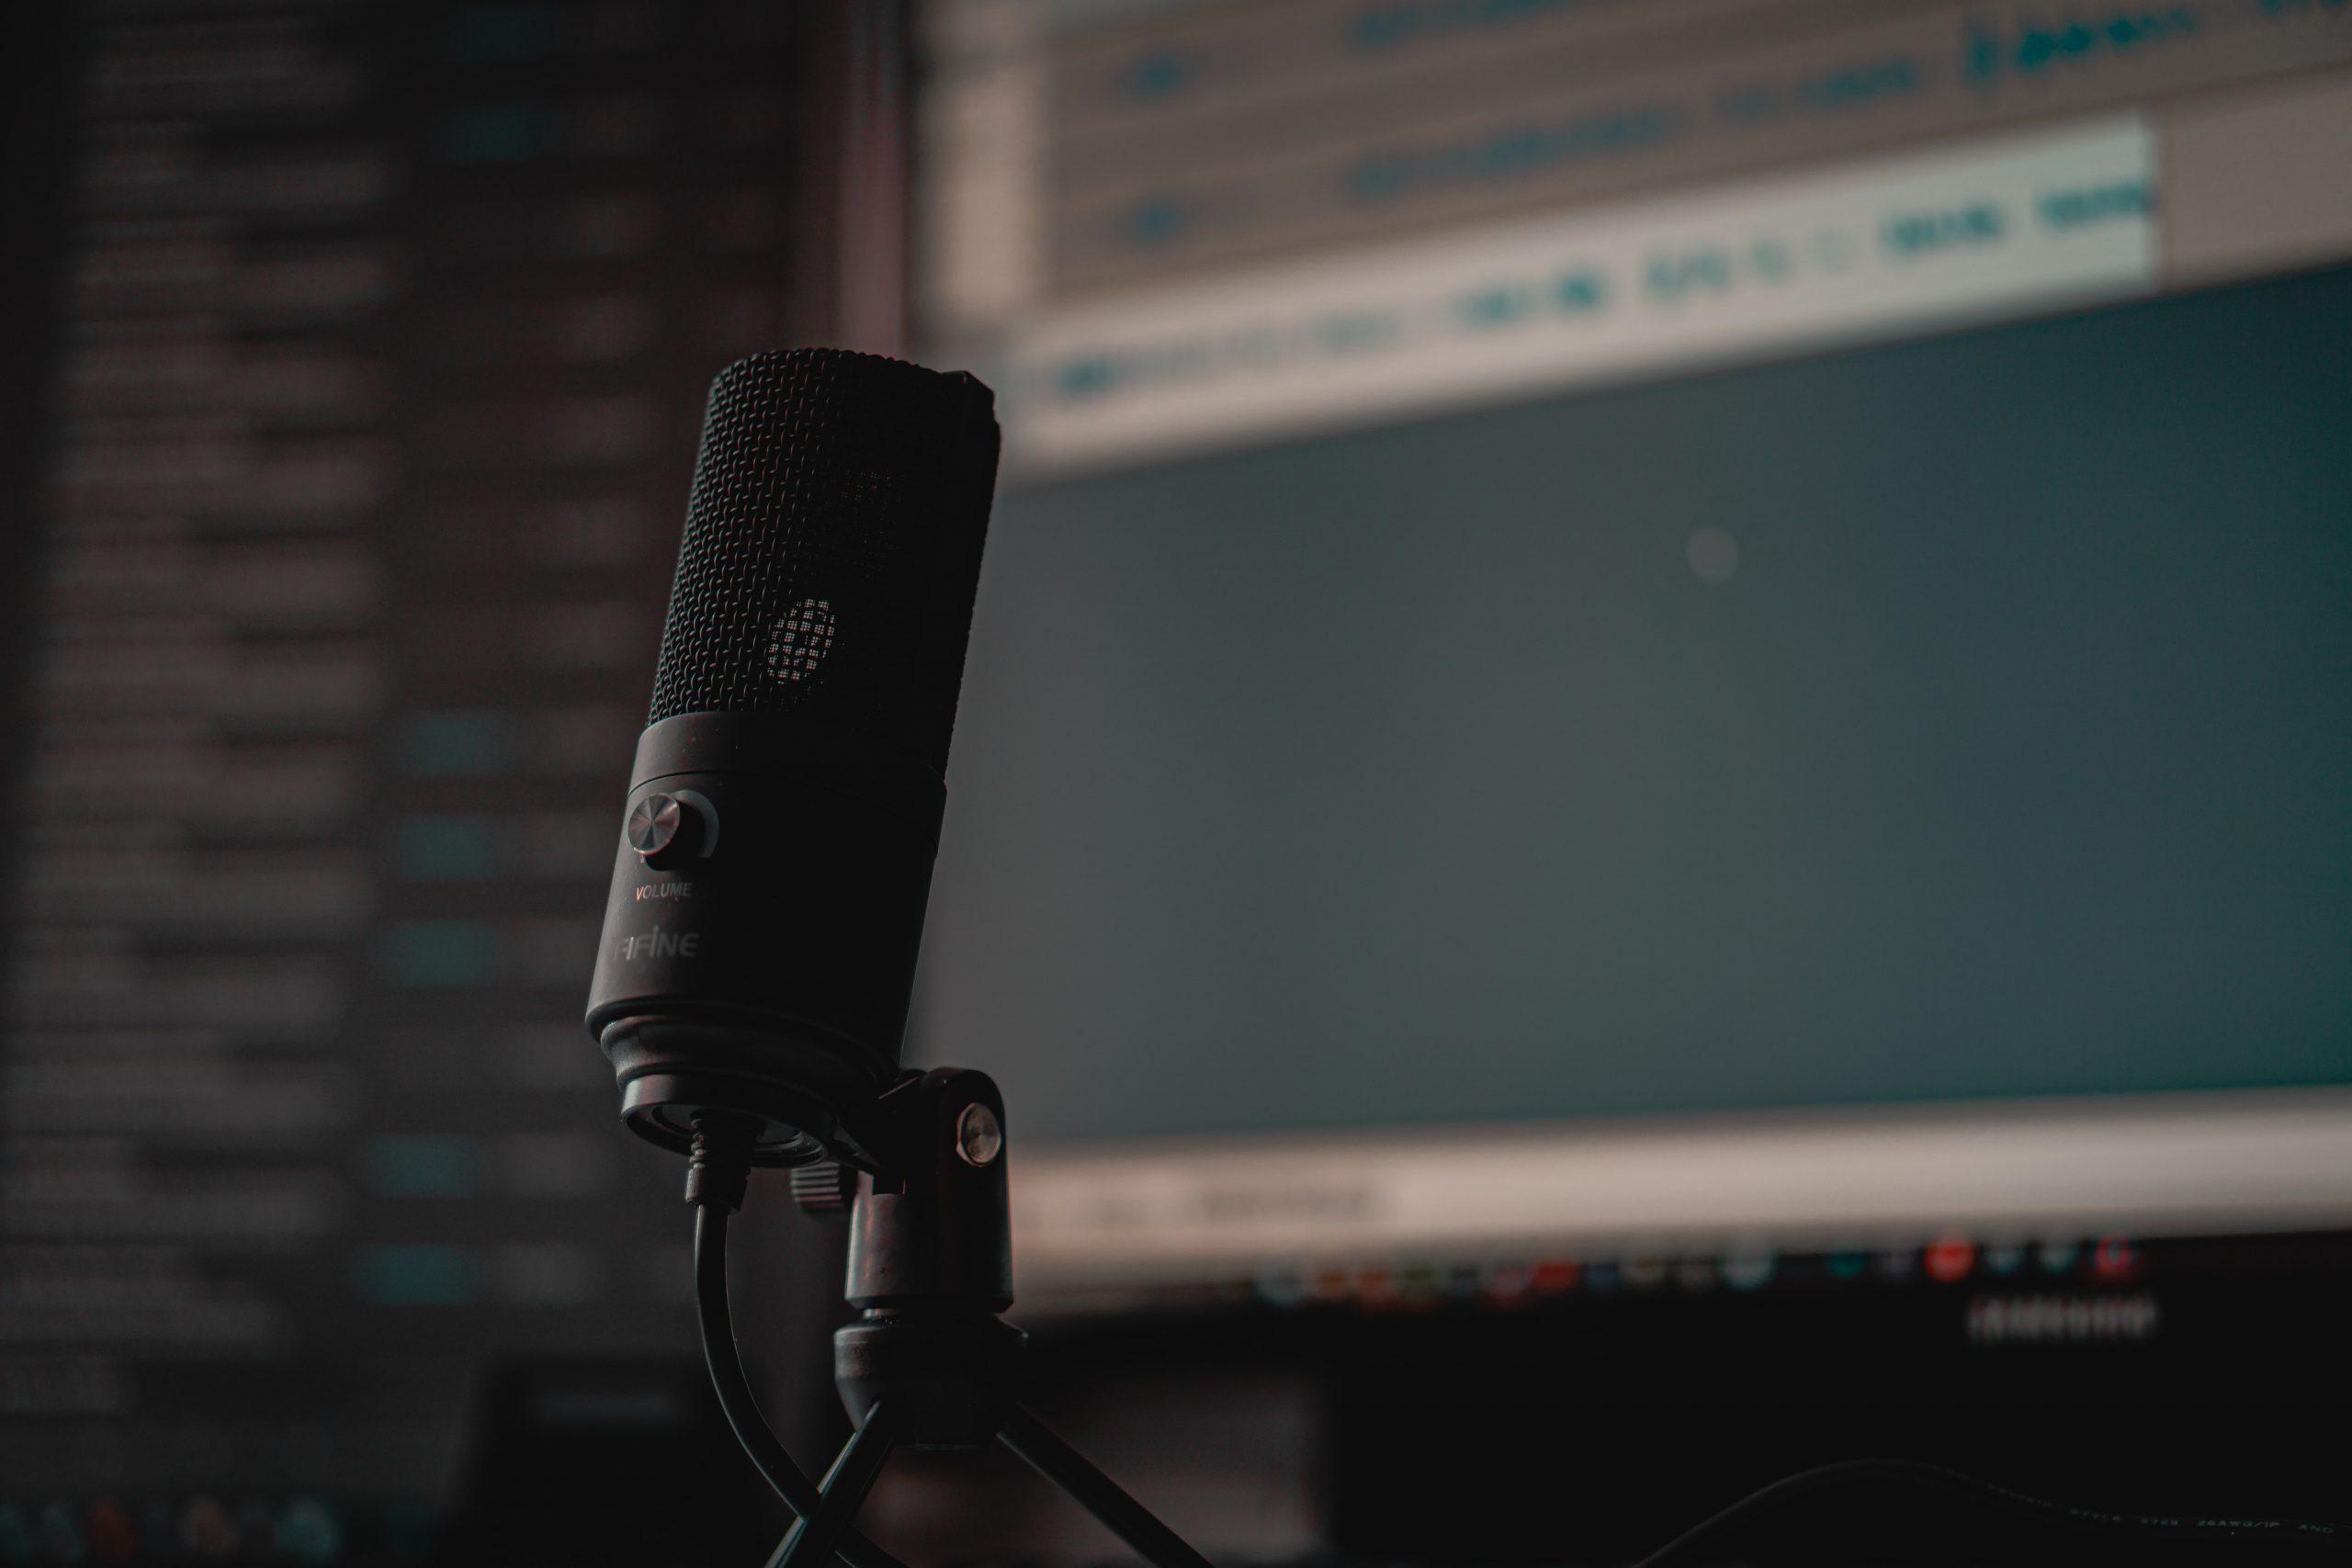 Tikkie Podcast 16 'Achterstanden' met Ivo Mijland